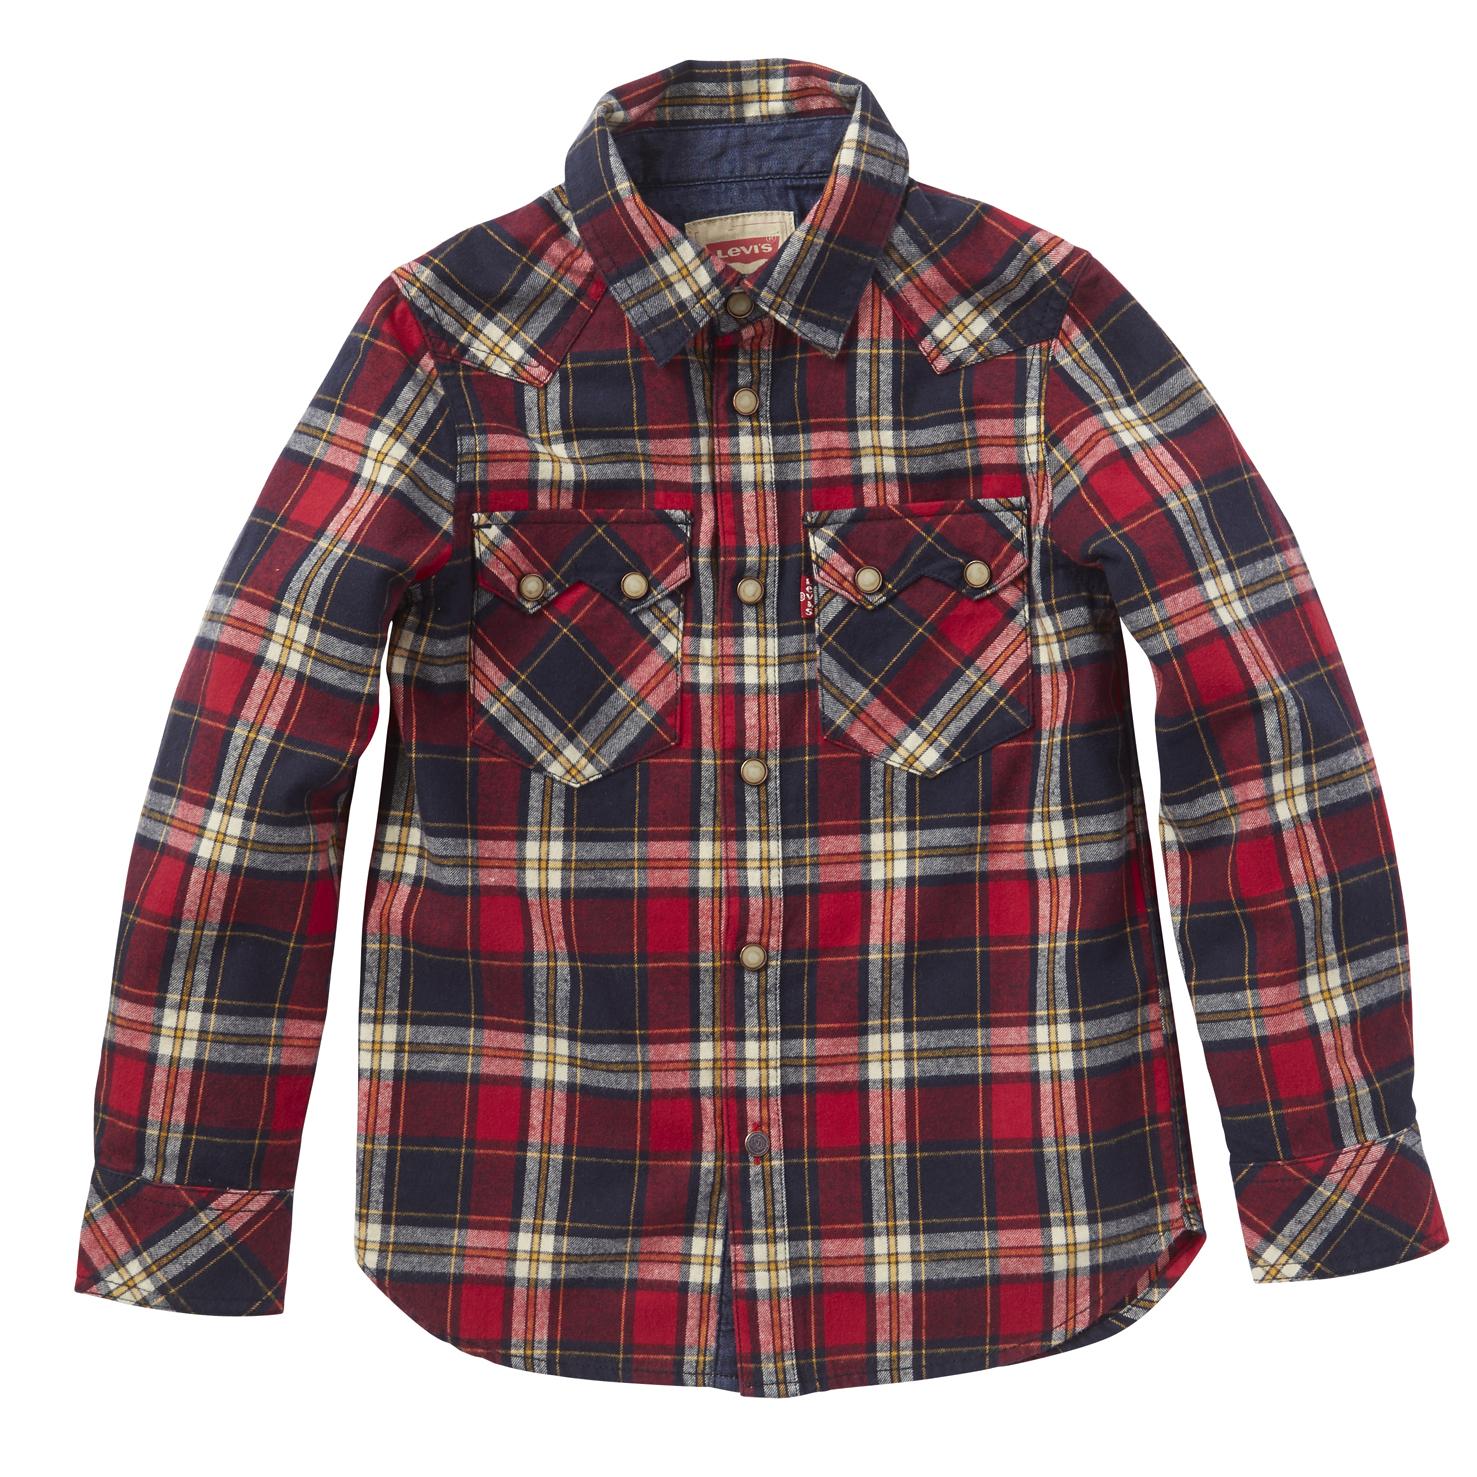 LEVI'S KIDS – Παιδικό πουκάμισο Levi's Kids κόκκινο